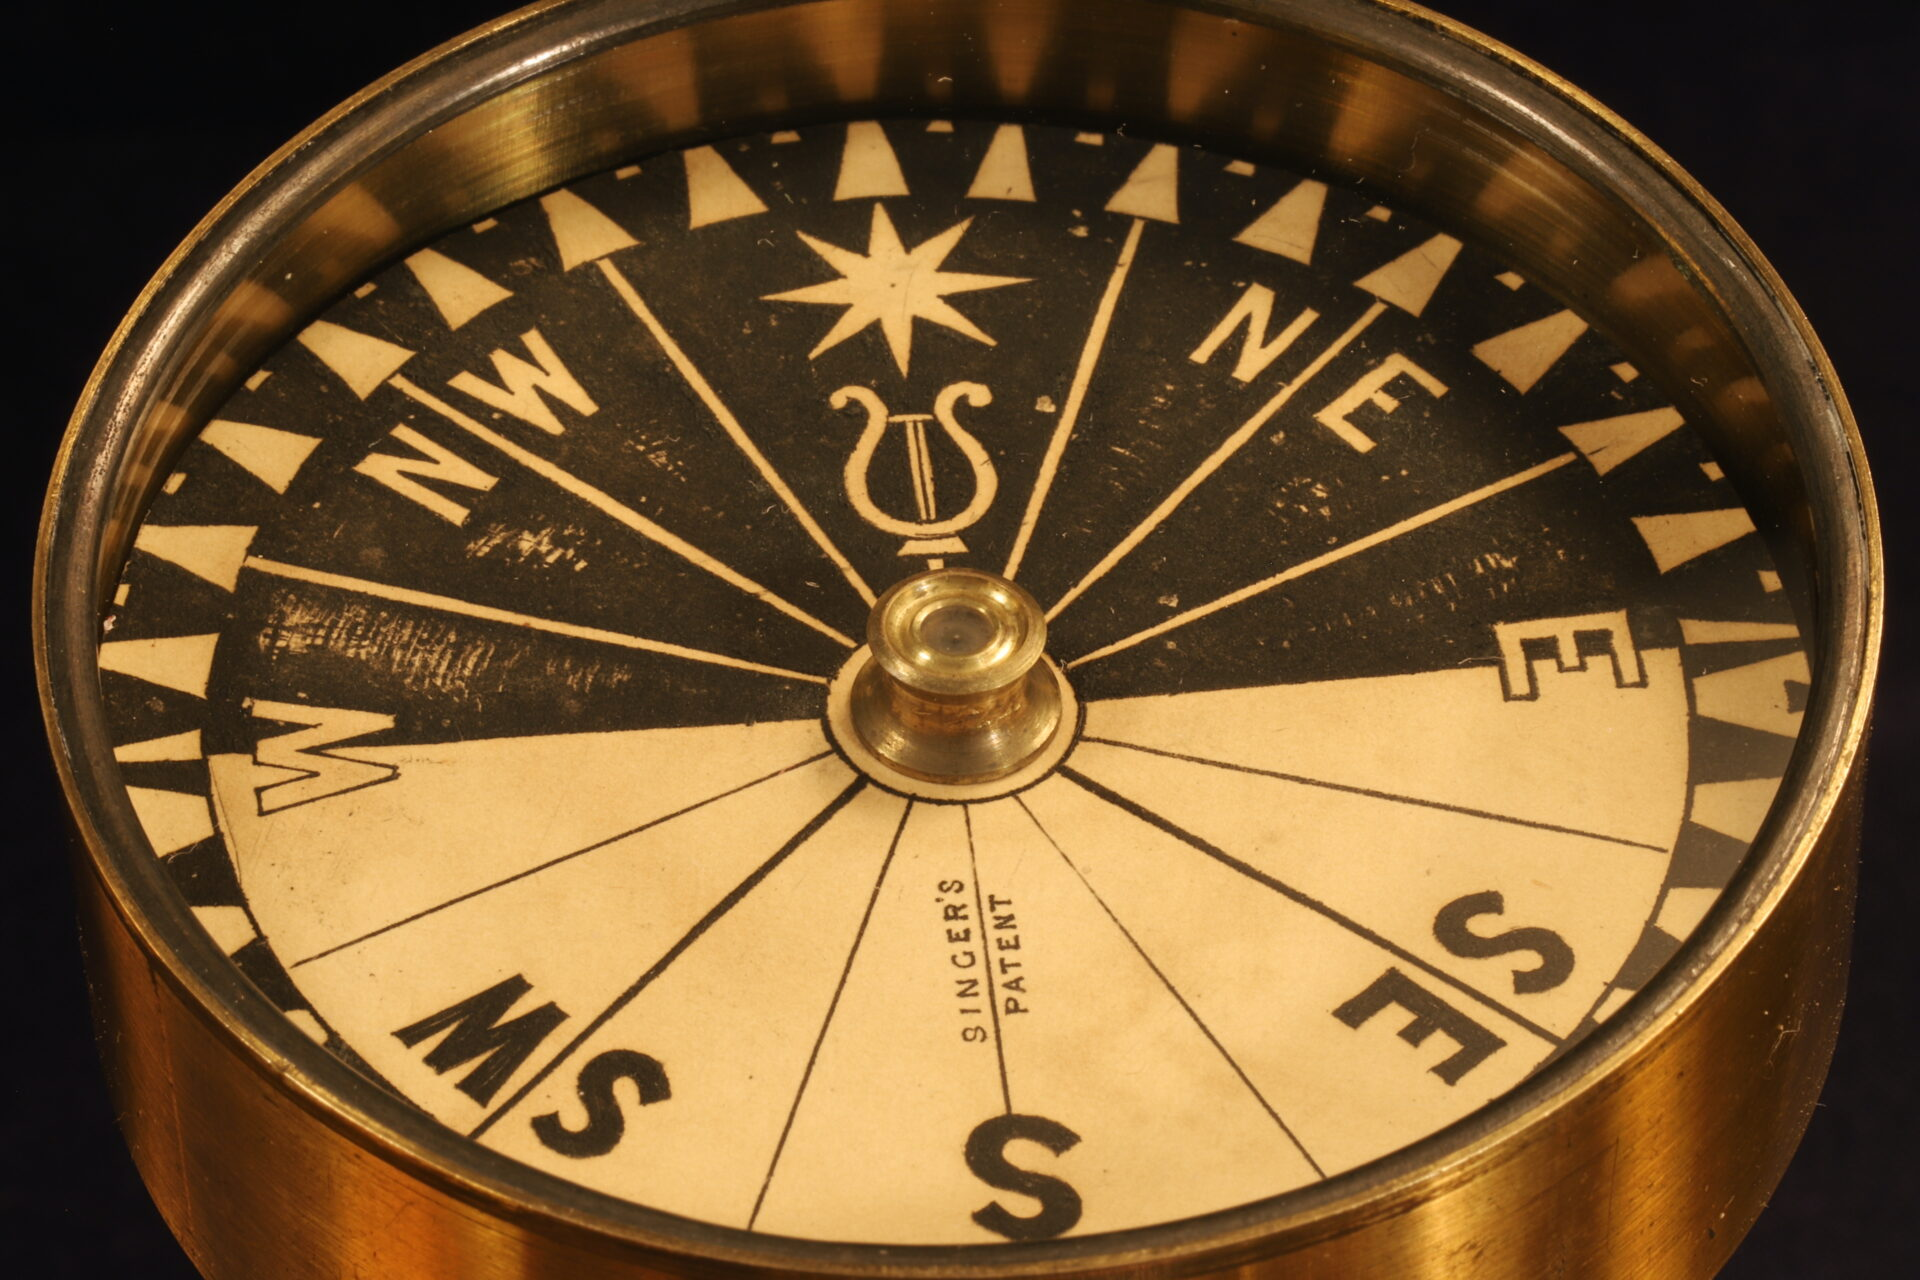 Close up of Explorers Singers Patent Compass c1870